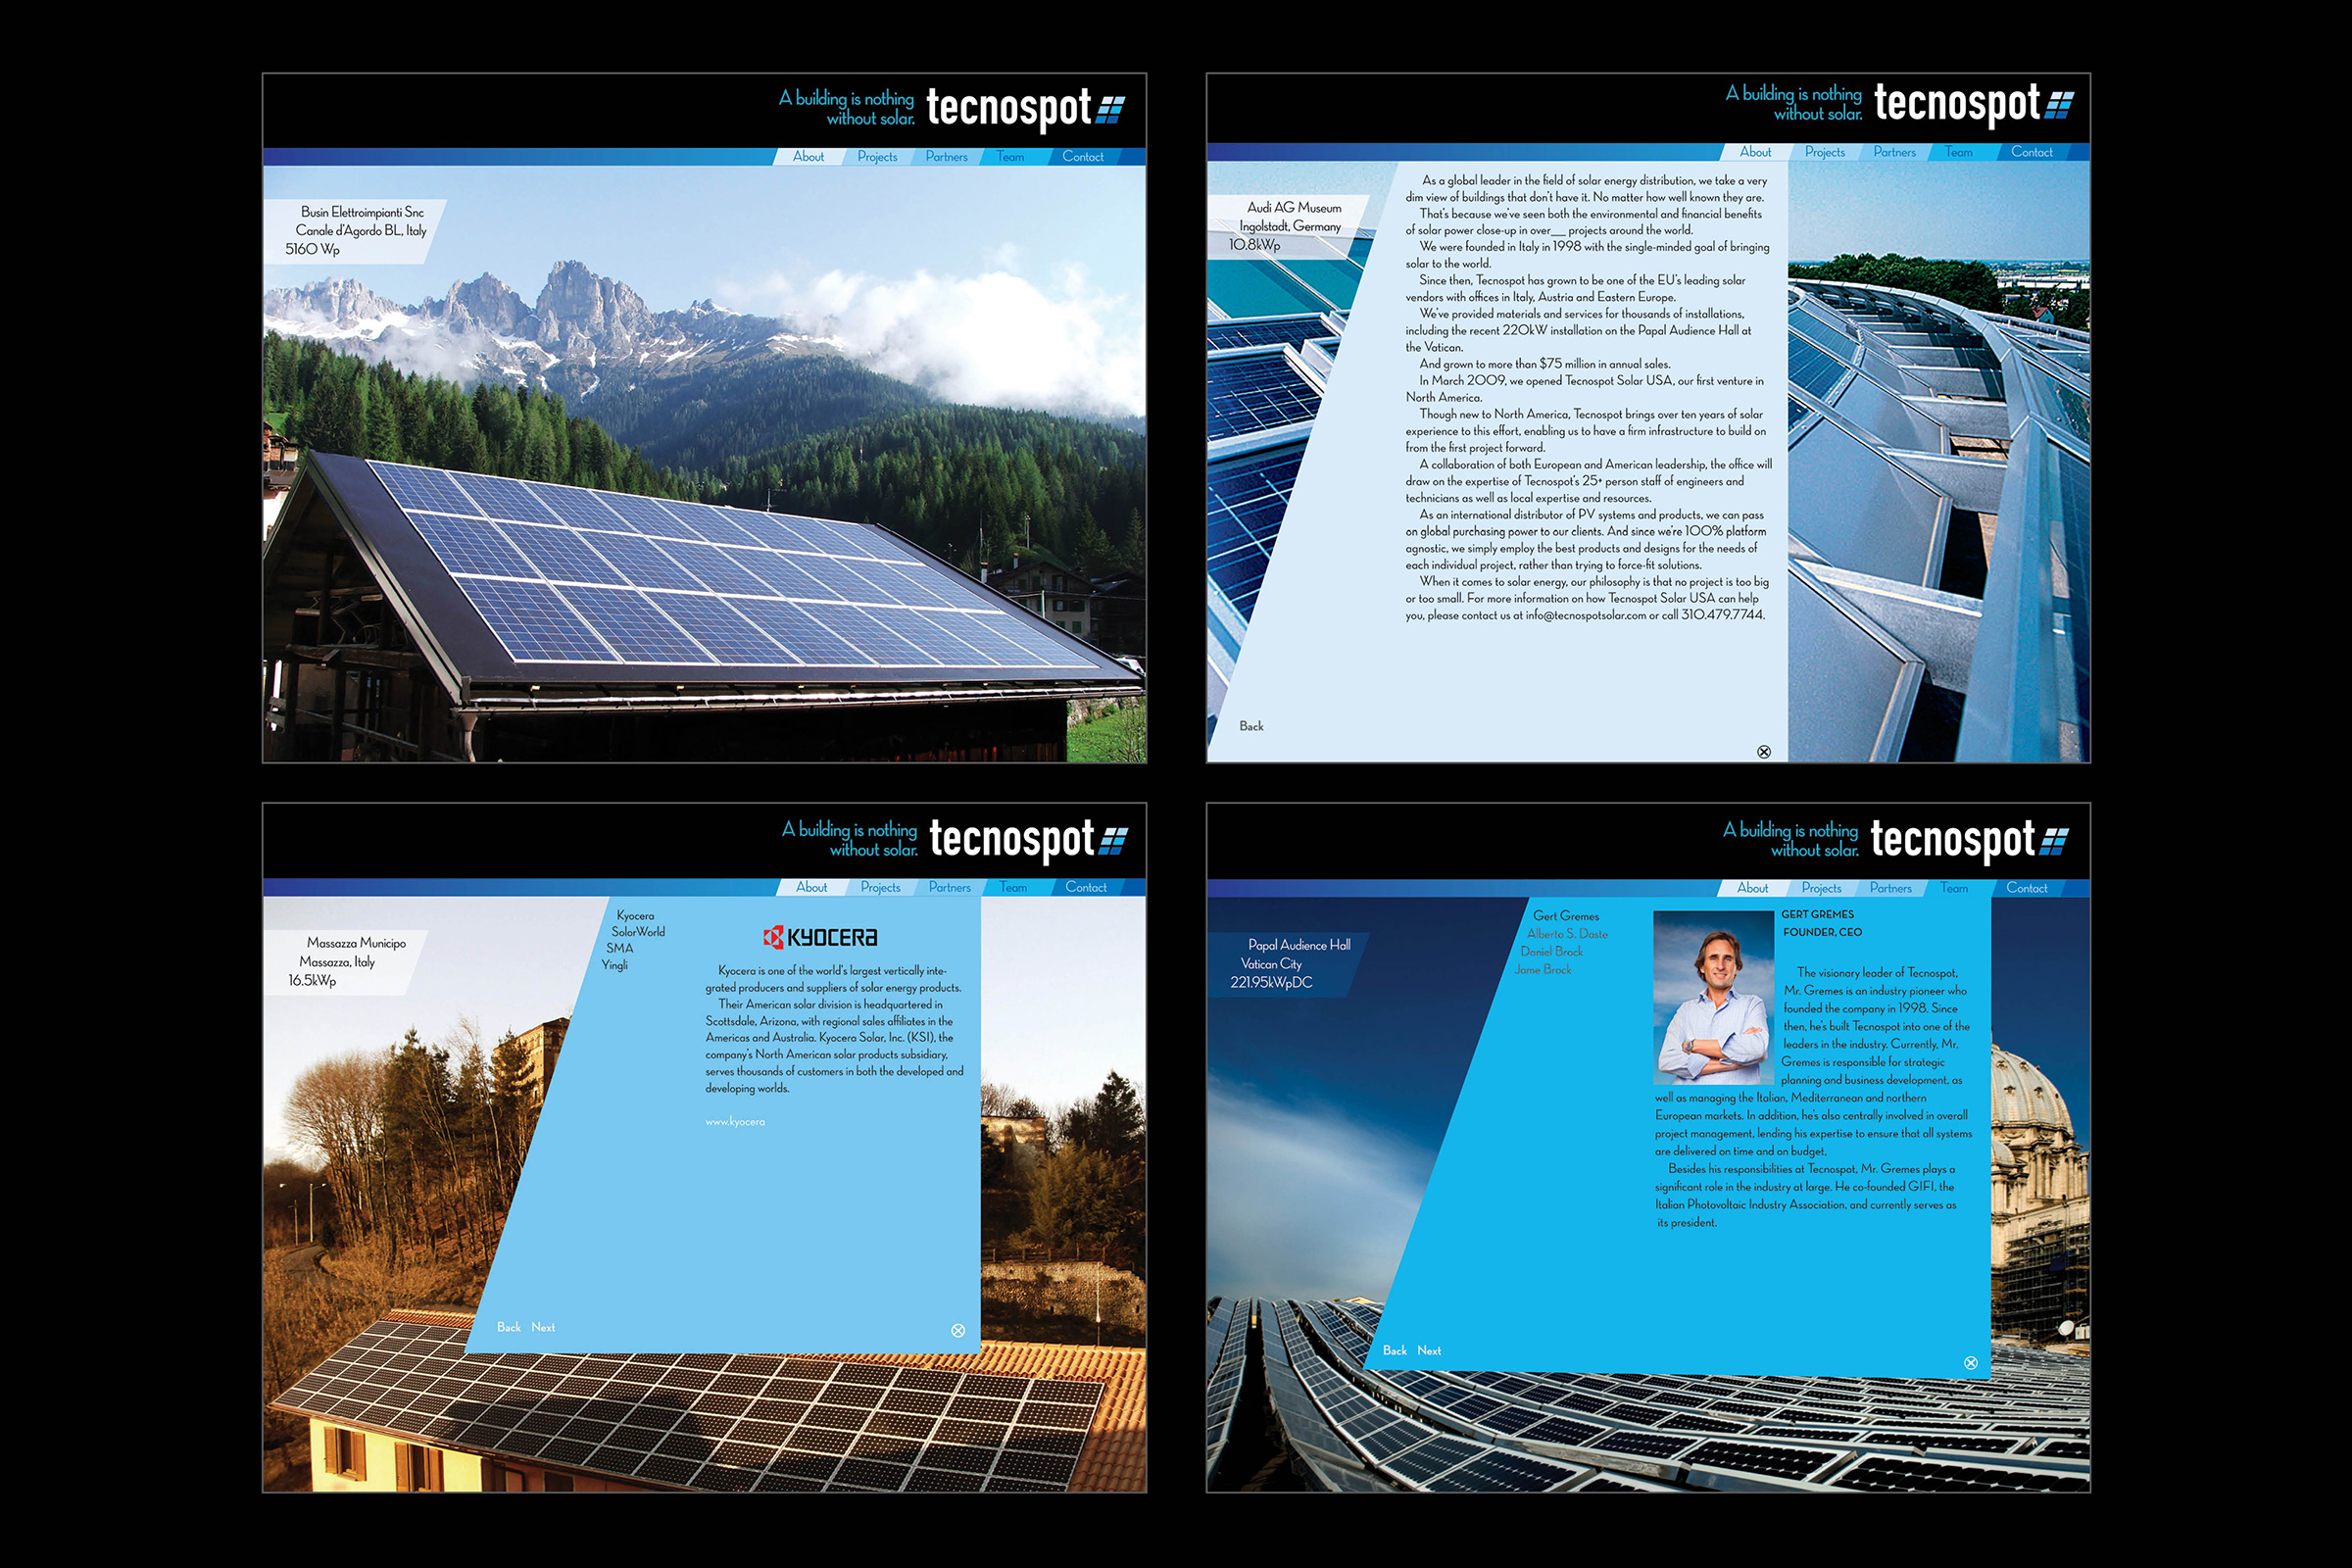 tecno-web-page.jpg